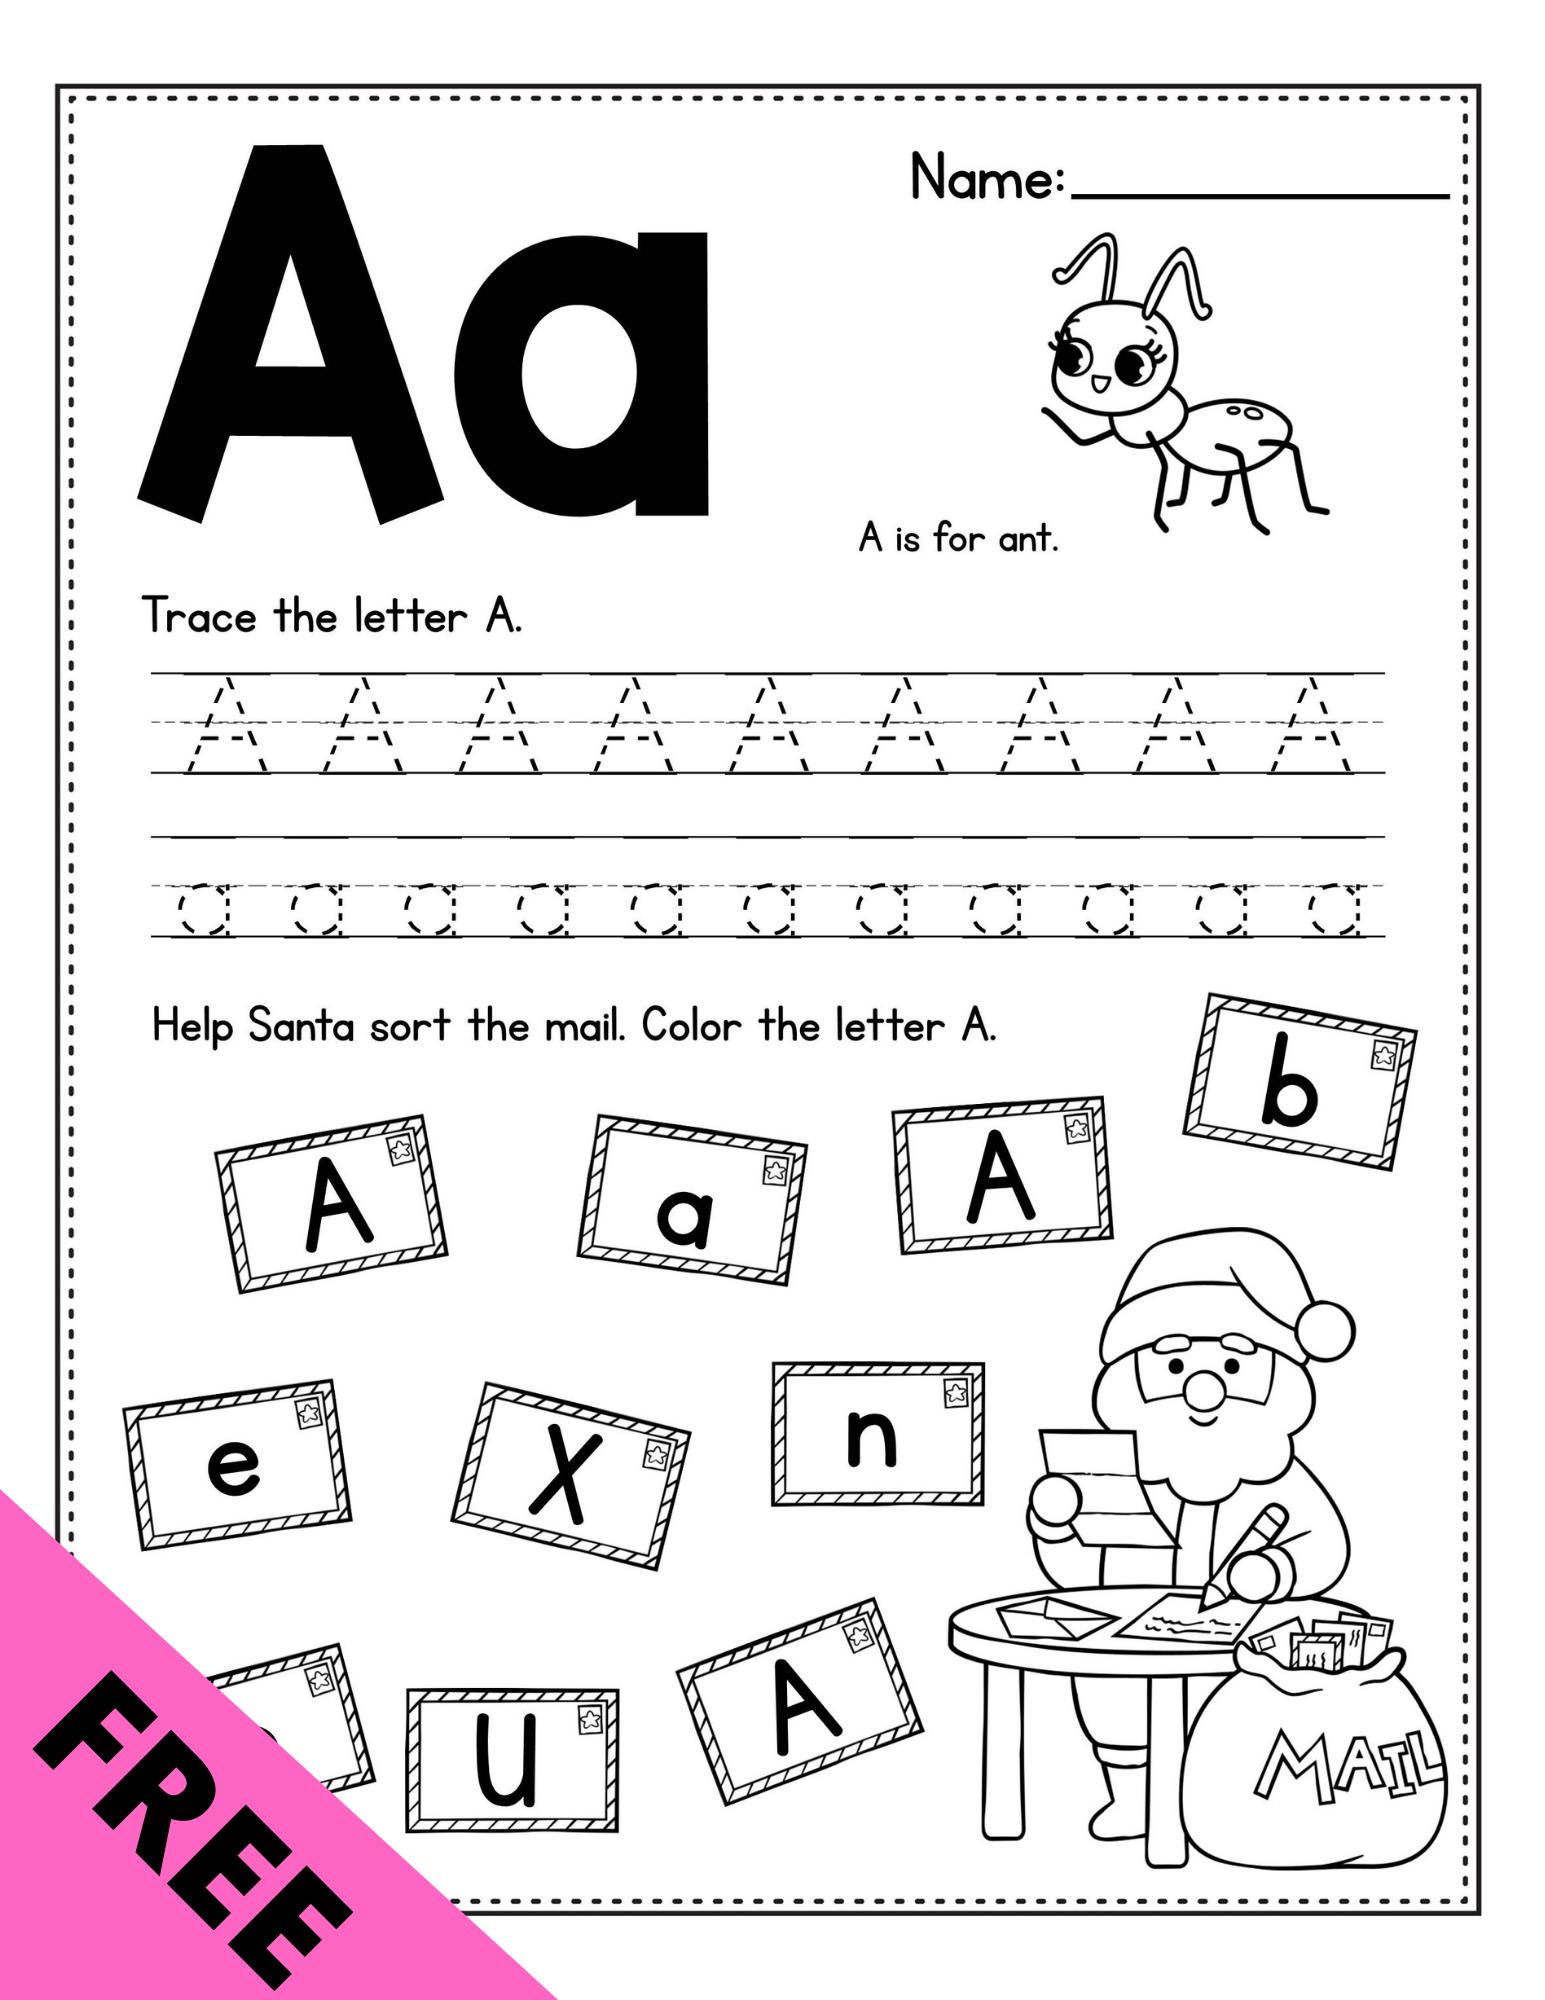 FREE Christmas Worksheets for Kindergarten   Christmas worksheets  kindergarten [ 2000 x 1545 Pixel ]